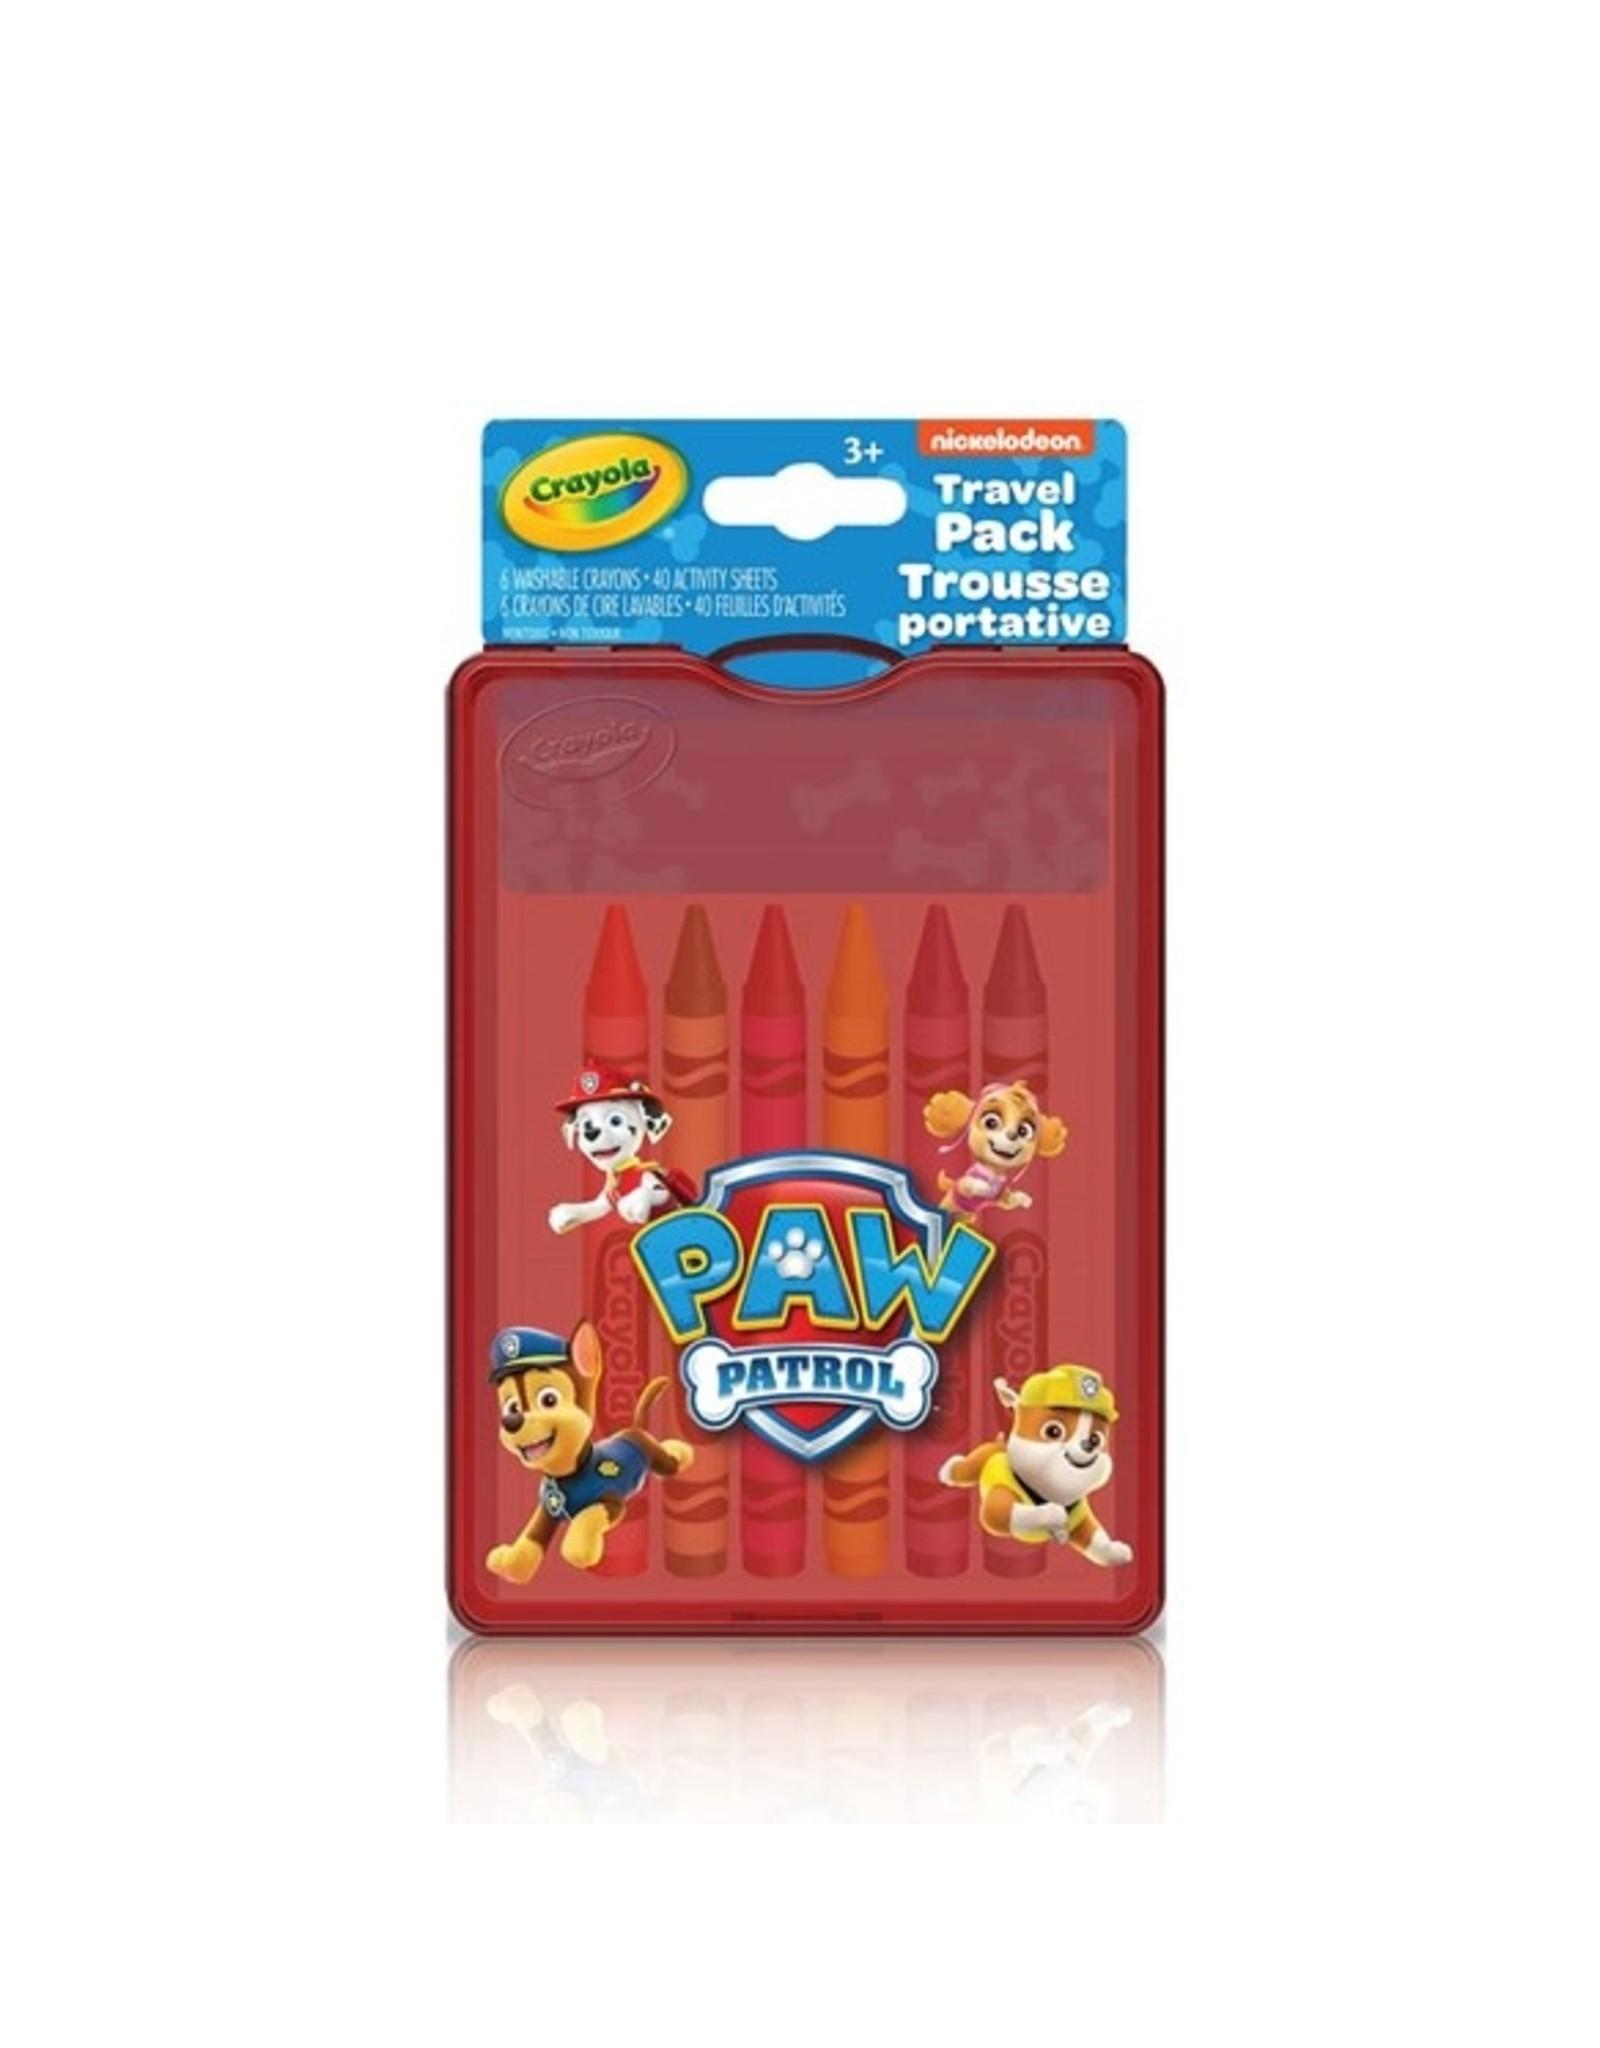 Crayola Travel Pack - Paw Patrol